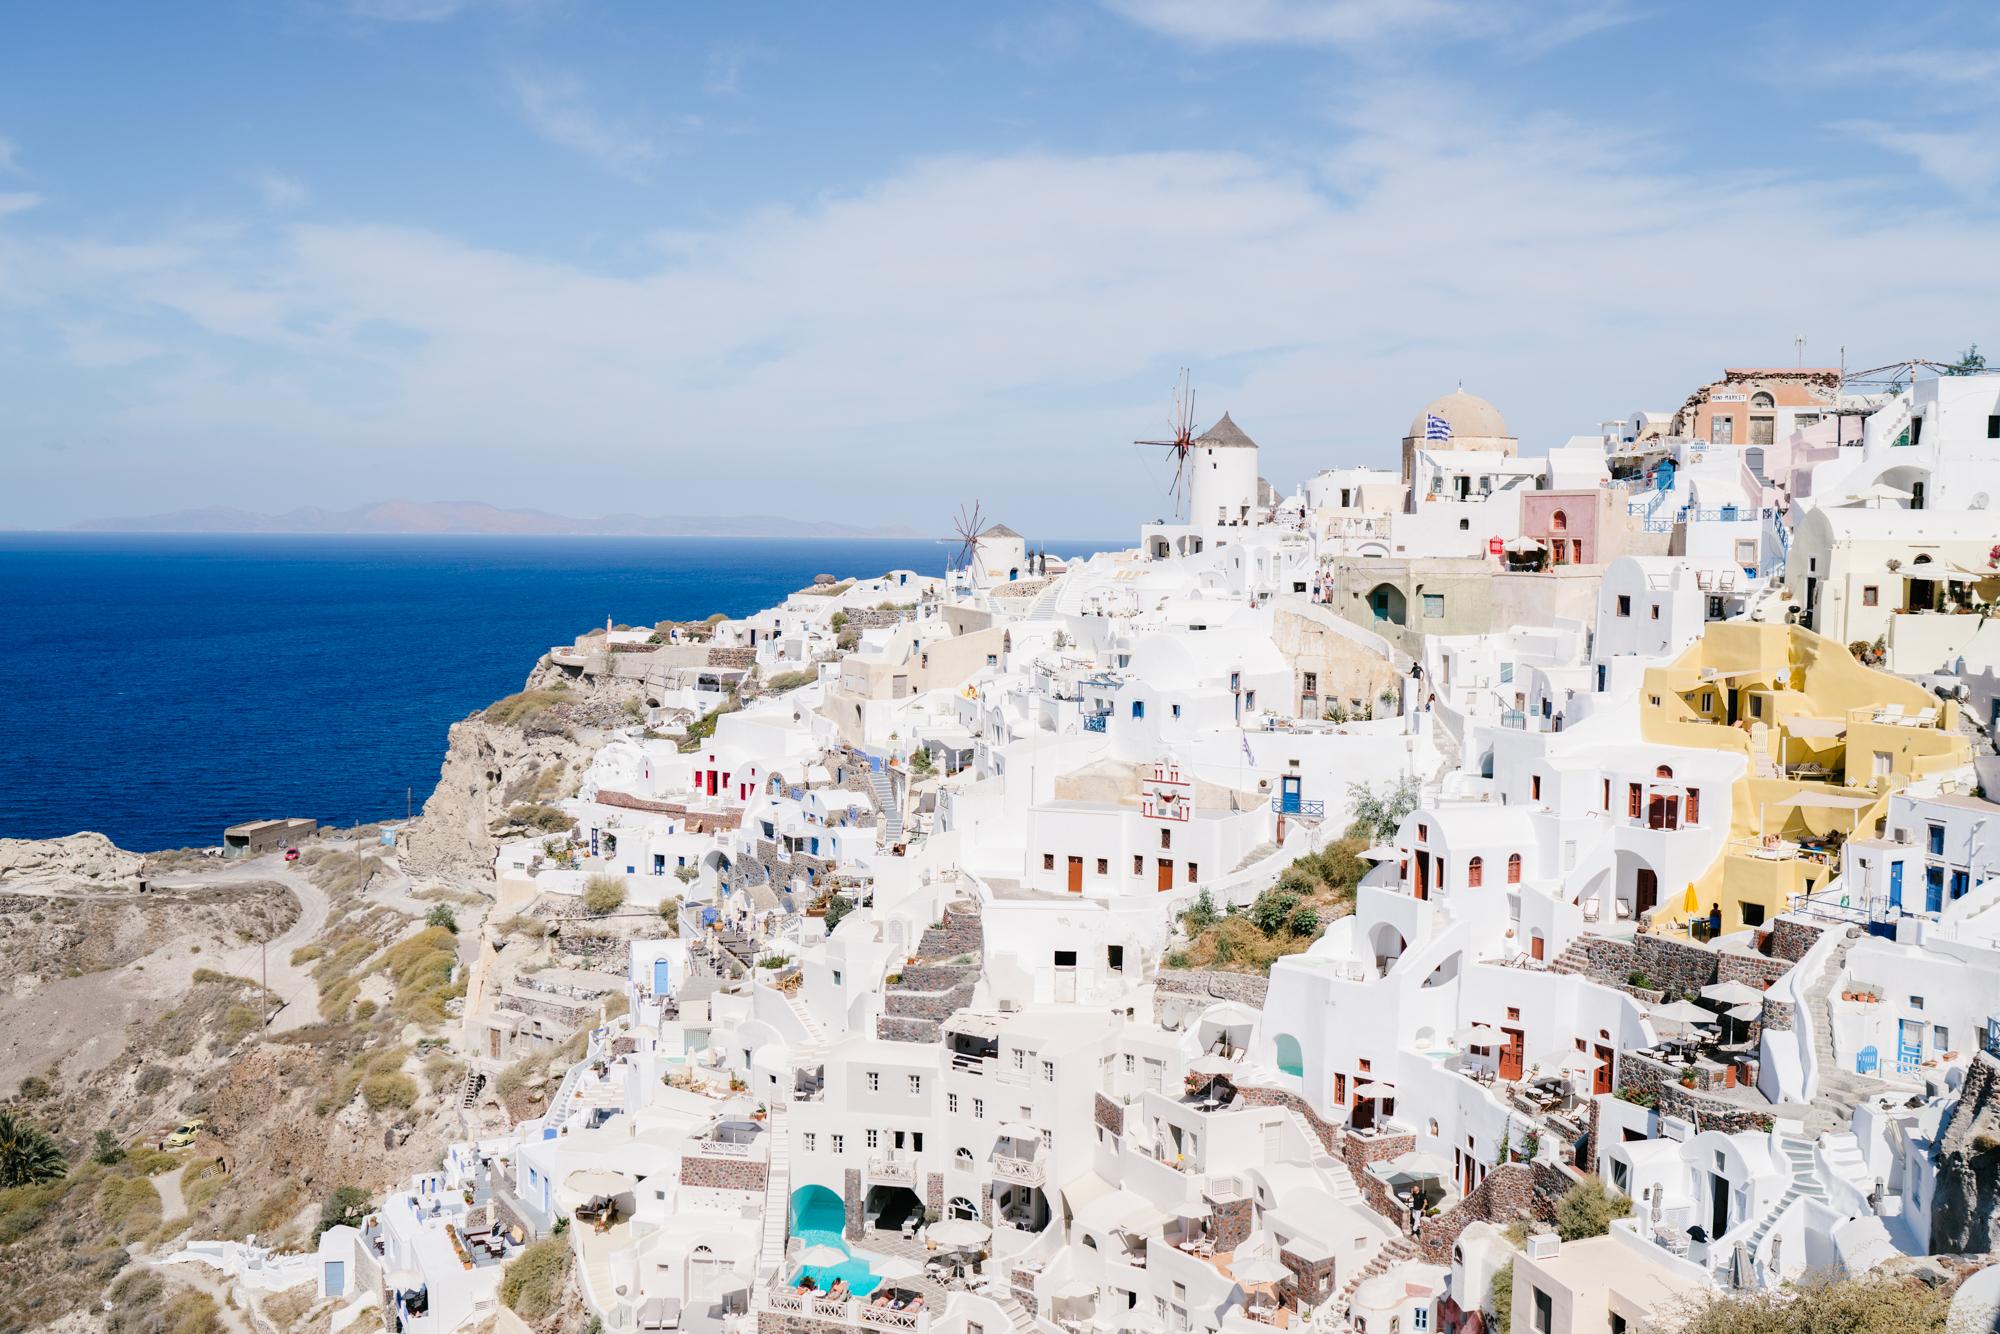 Classic postcard worthy views of Oia, Santorini